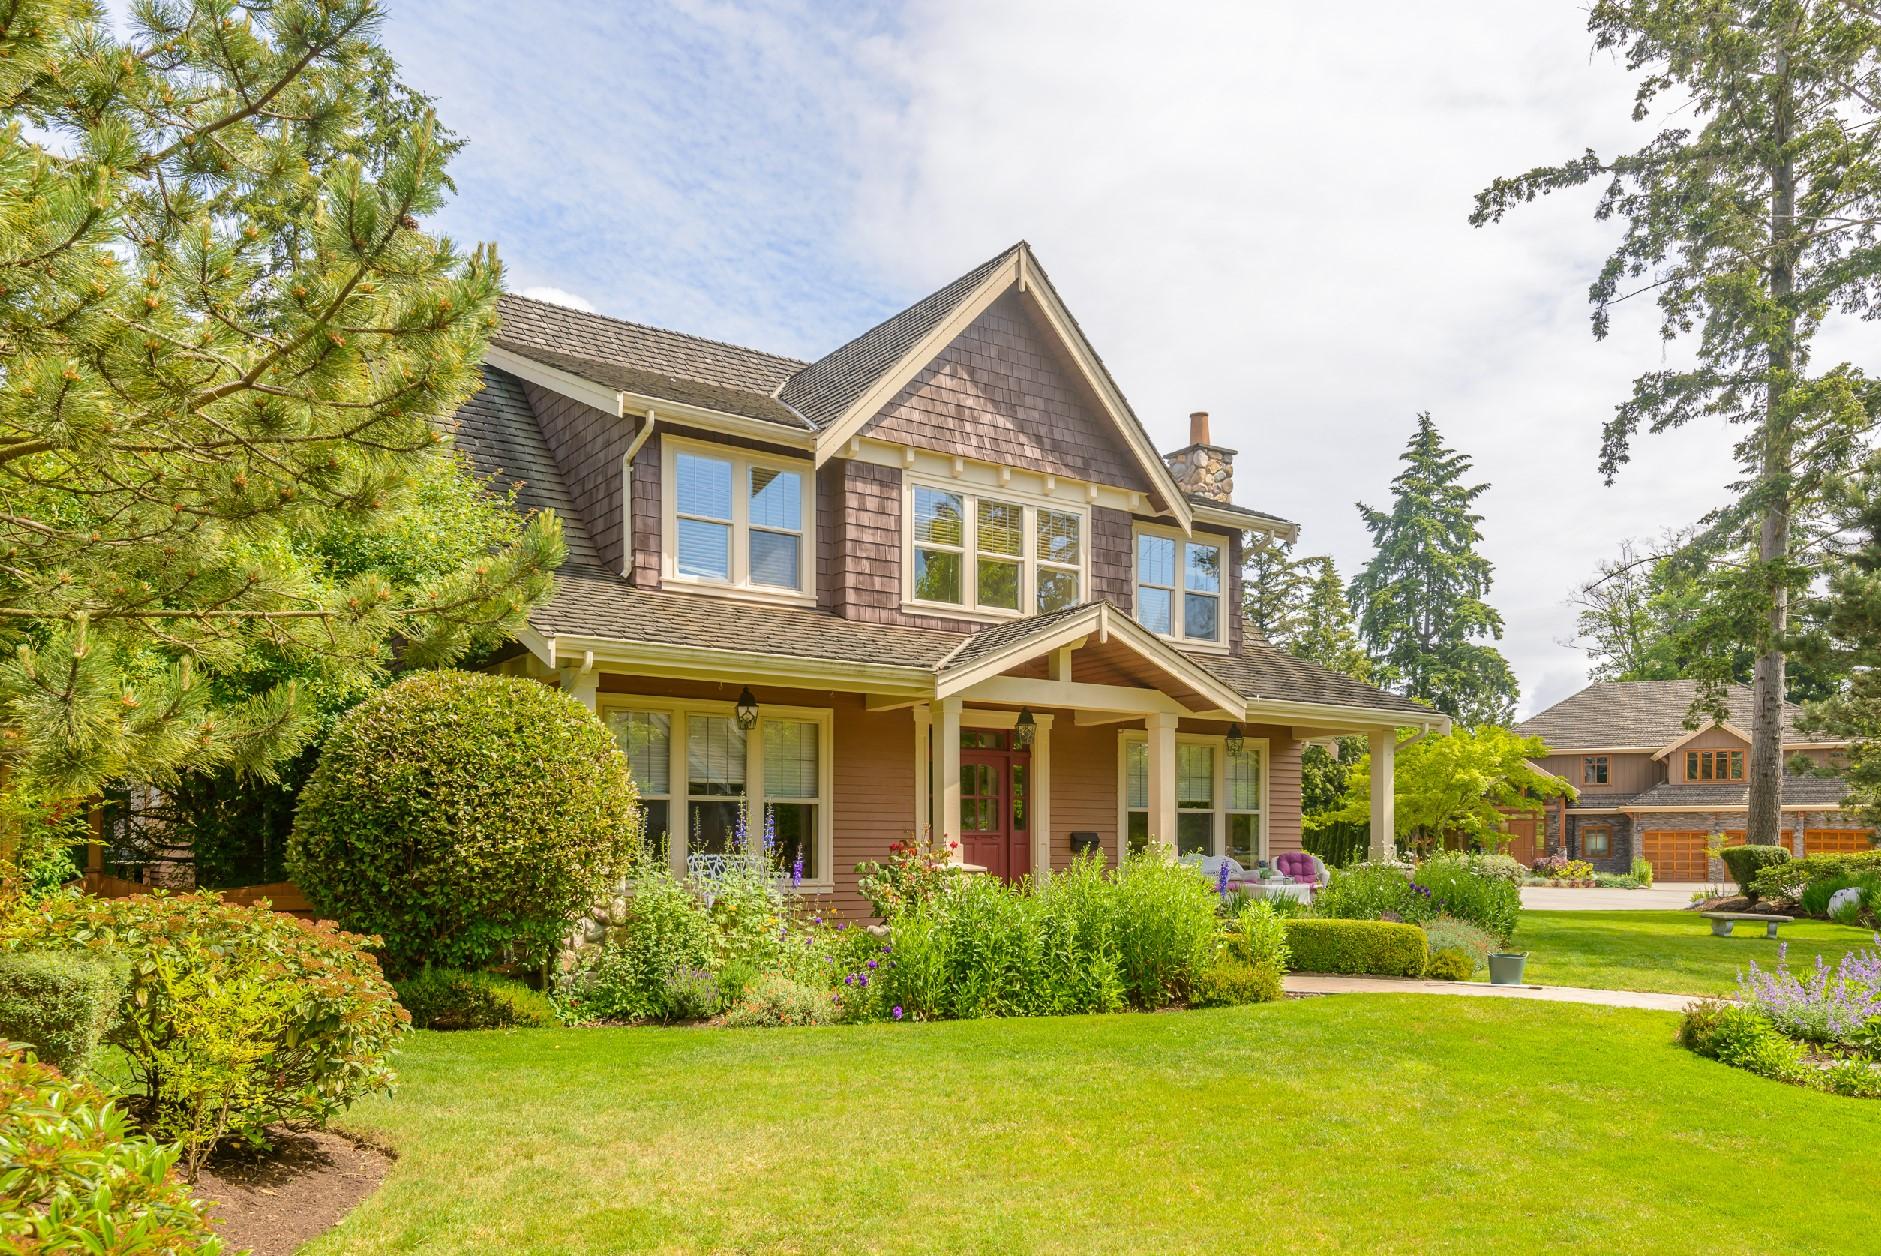 exterior, siding, cedar shakes, shingles, roof, landscaping